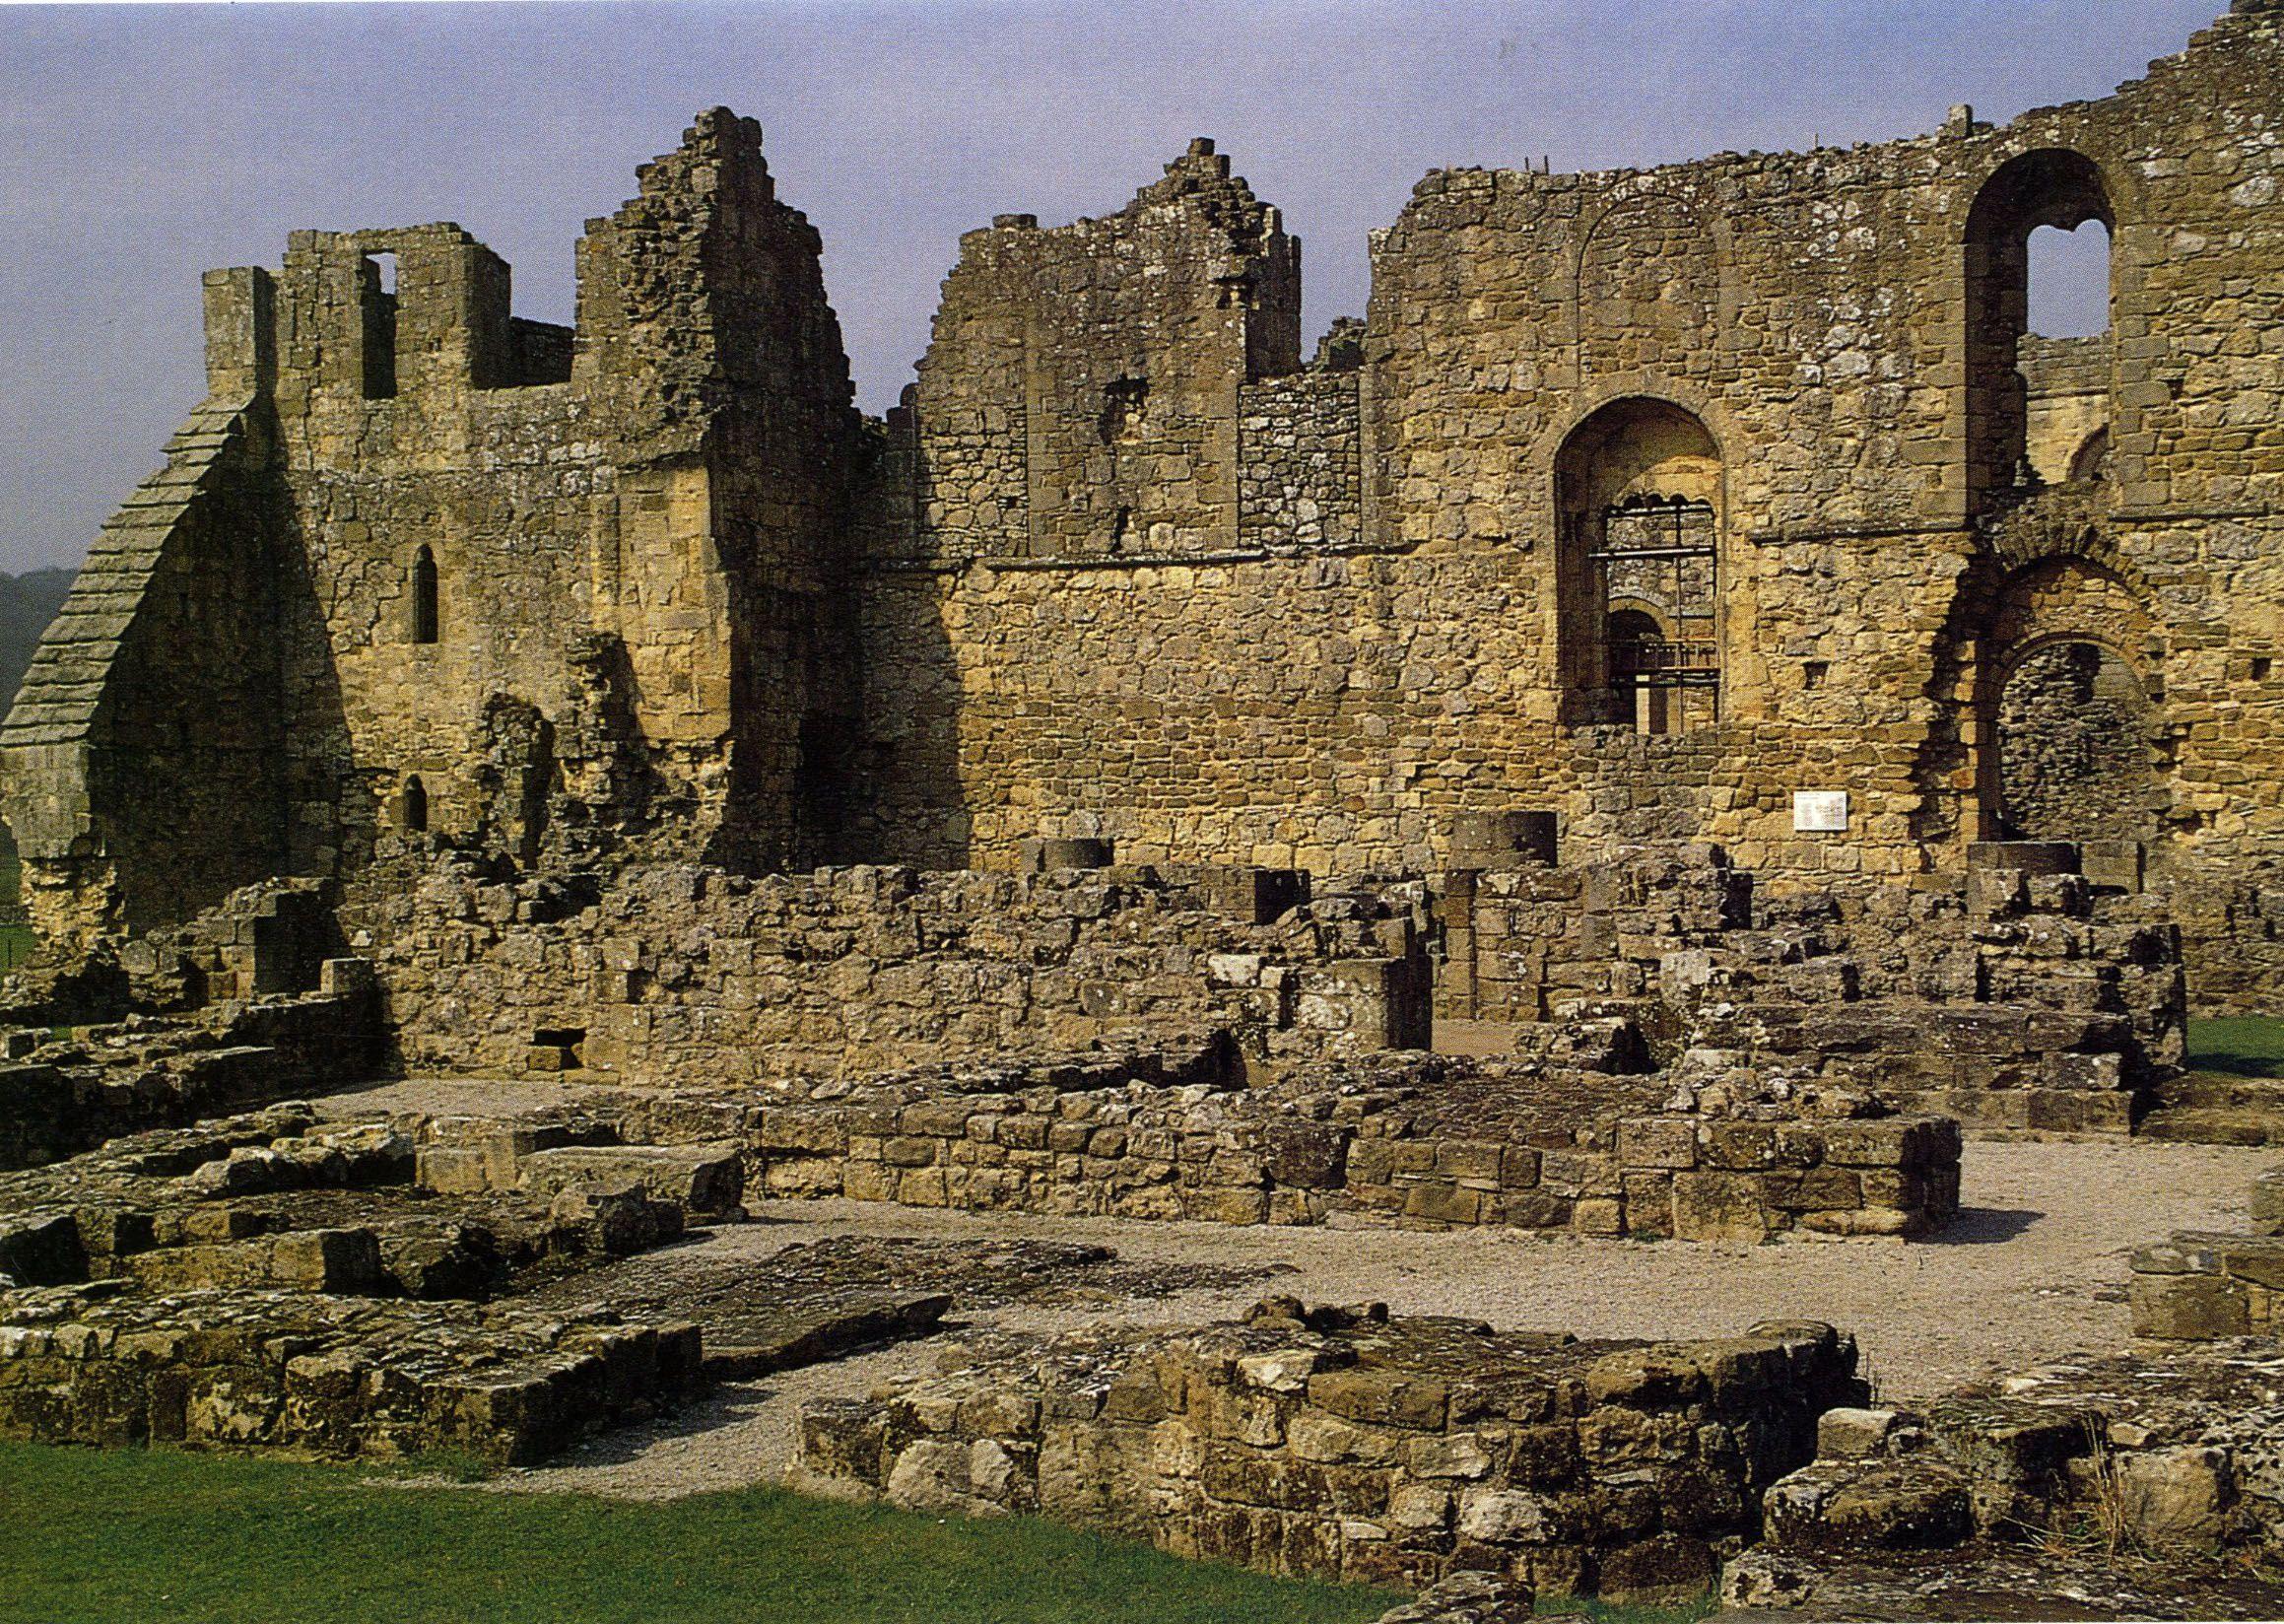 Infirmary Complex of Rievaulx Abbey